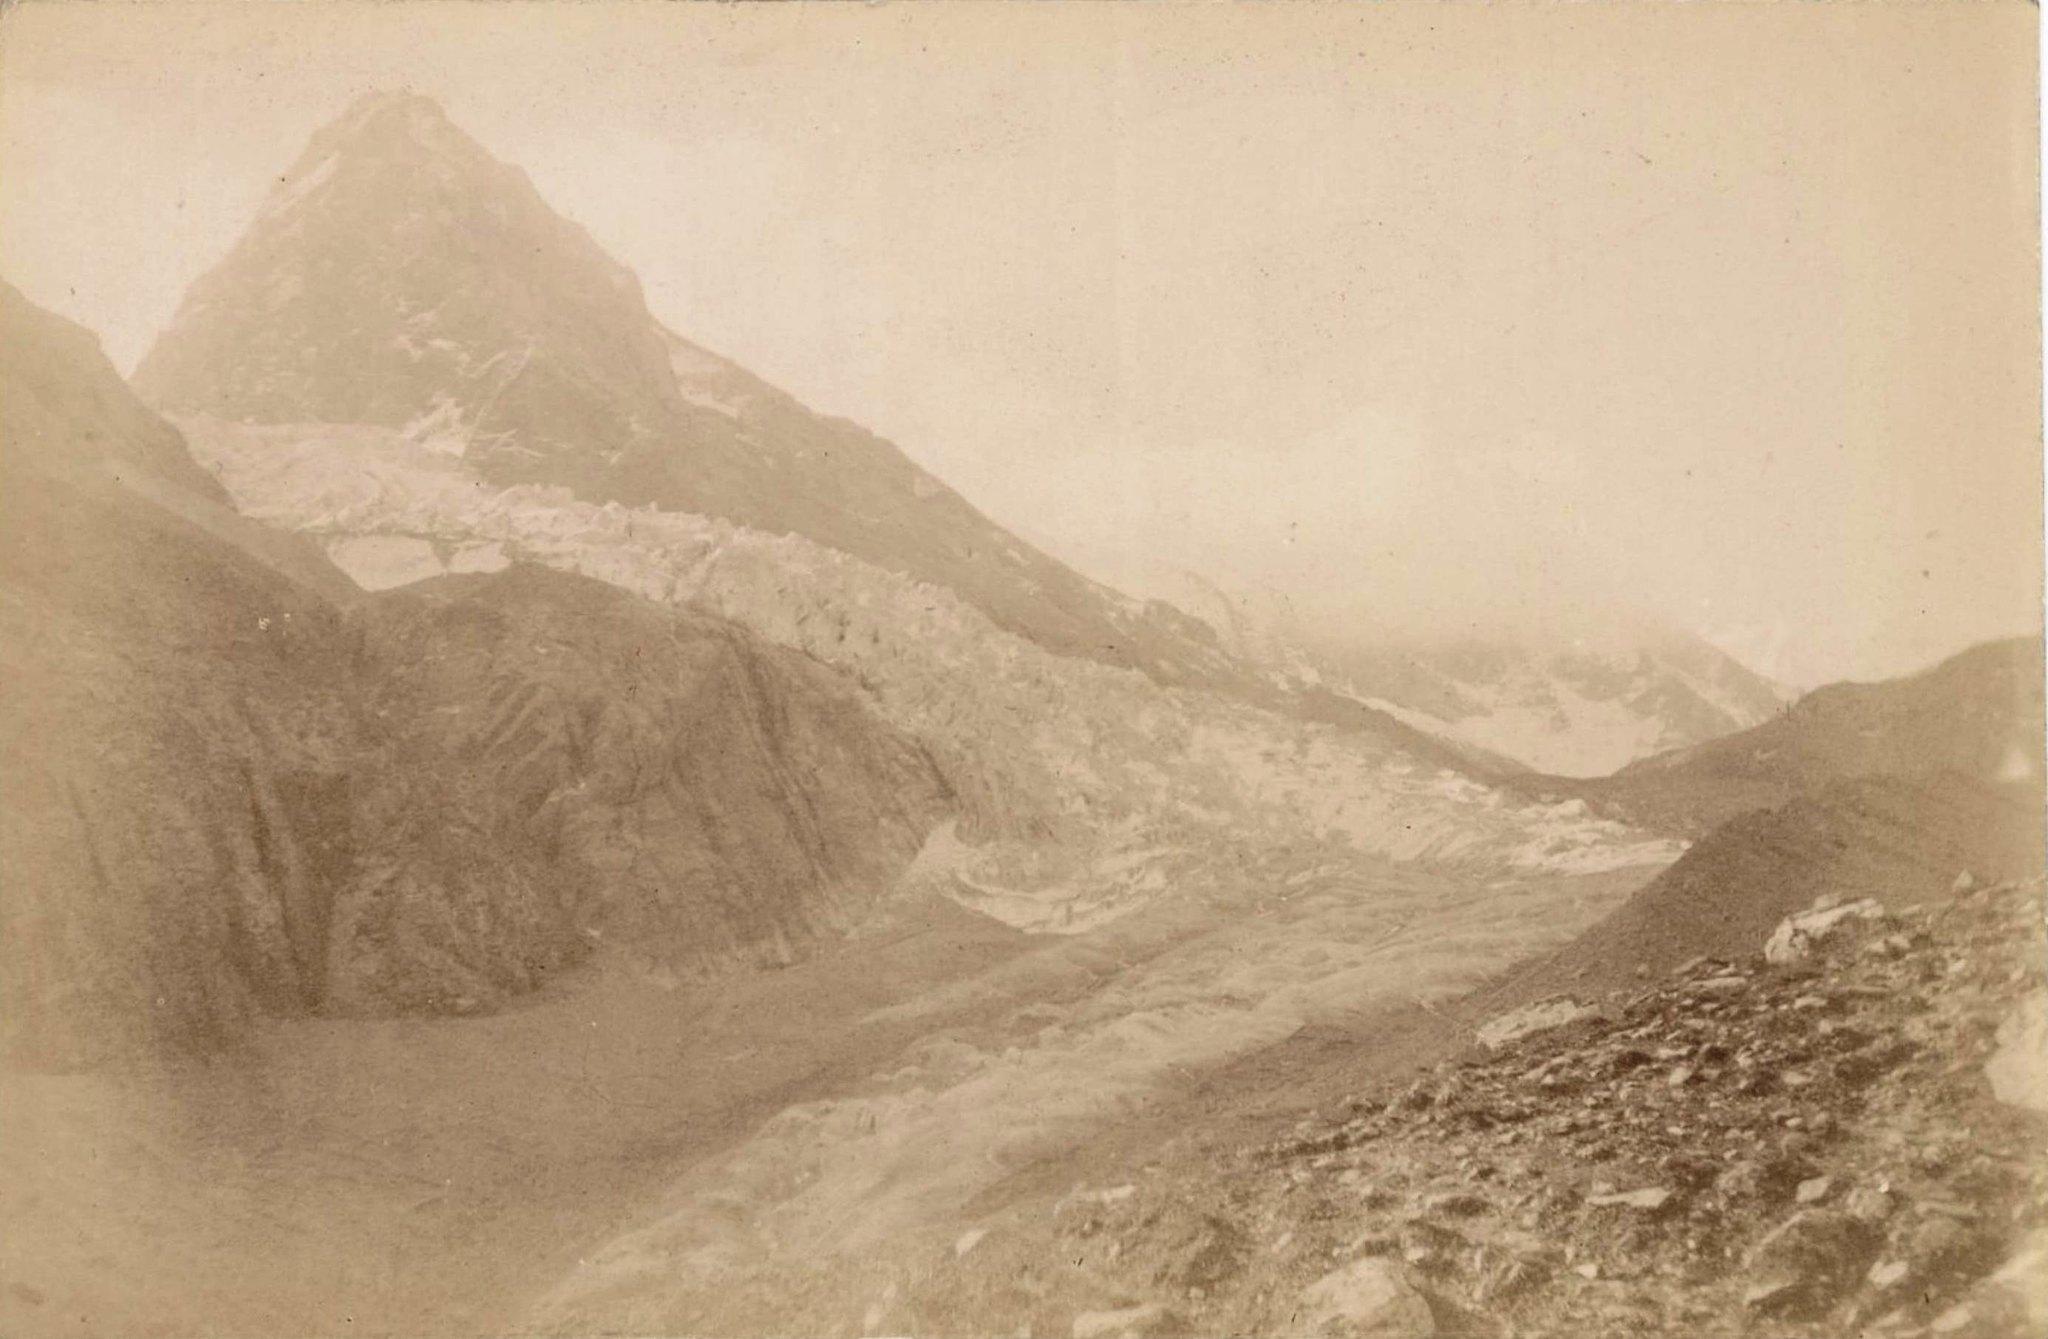 14. Ледники гор Хан-Тенгри. Ледник Западный Моцарт